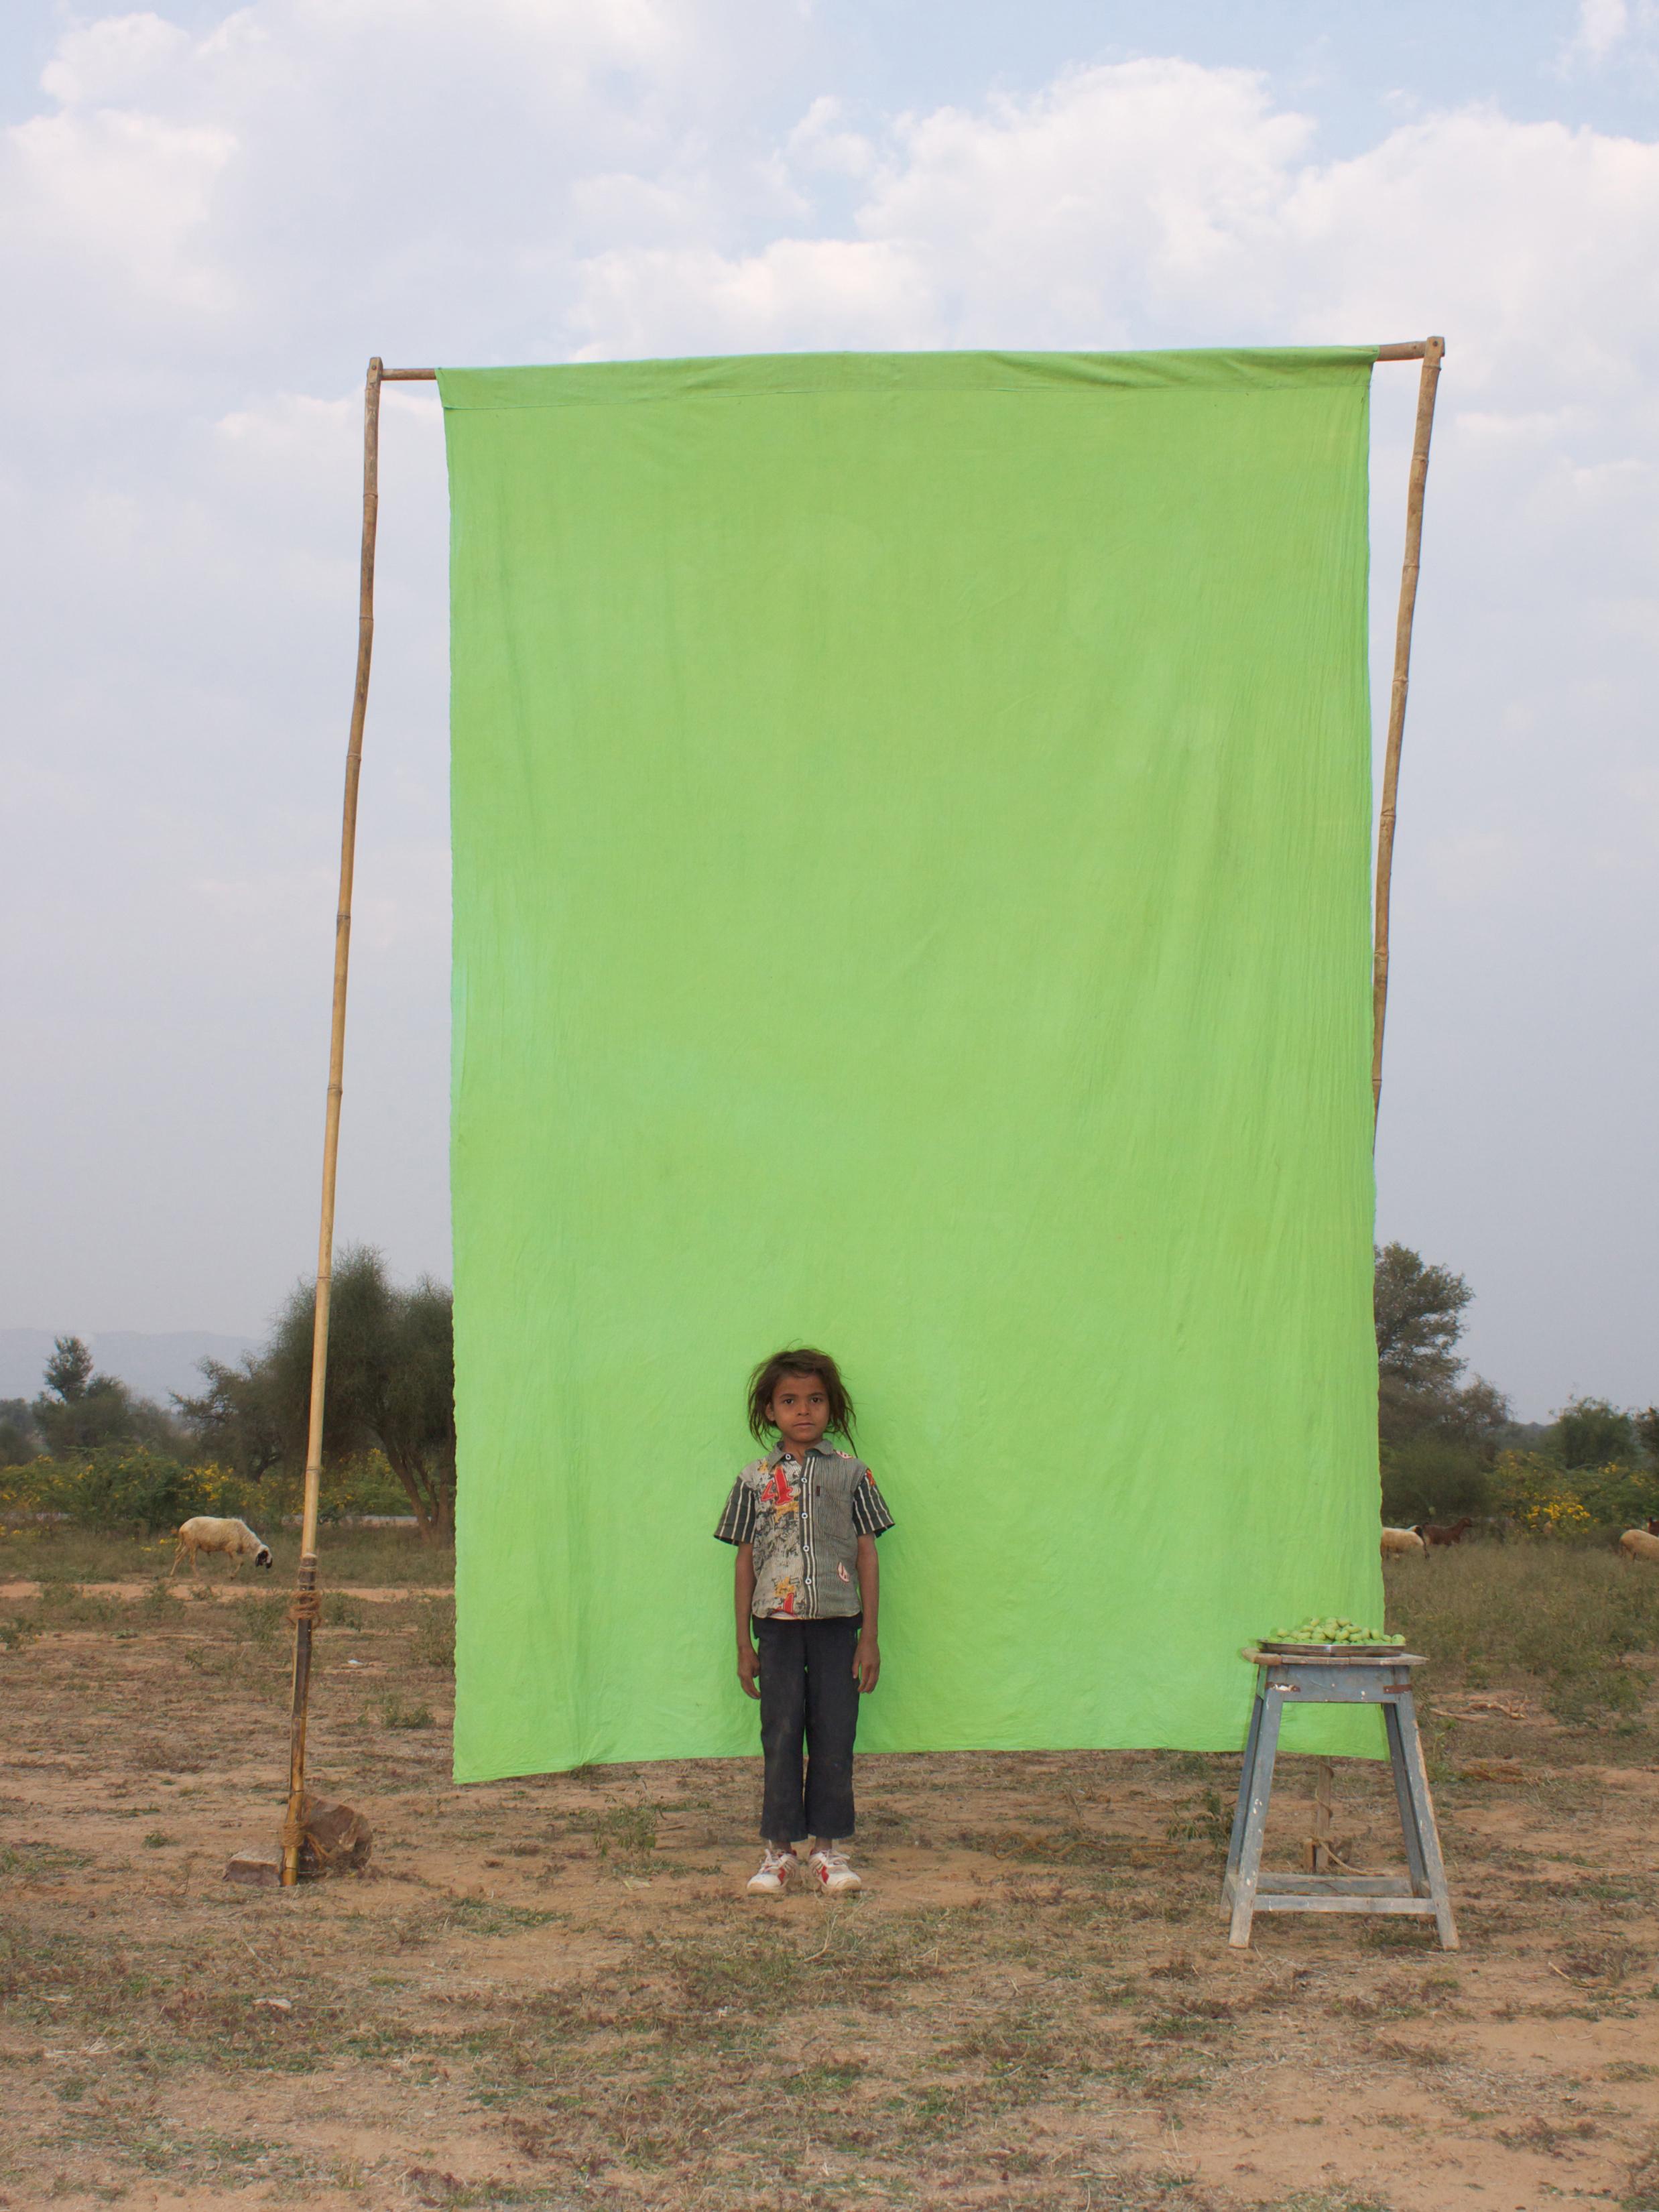 Benjamin Faga   Chroma Green No. 9    C-print    30 x 40 inches